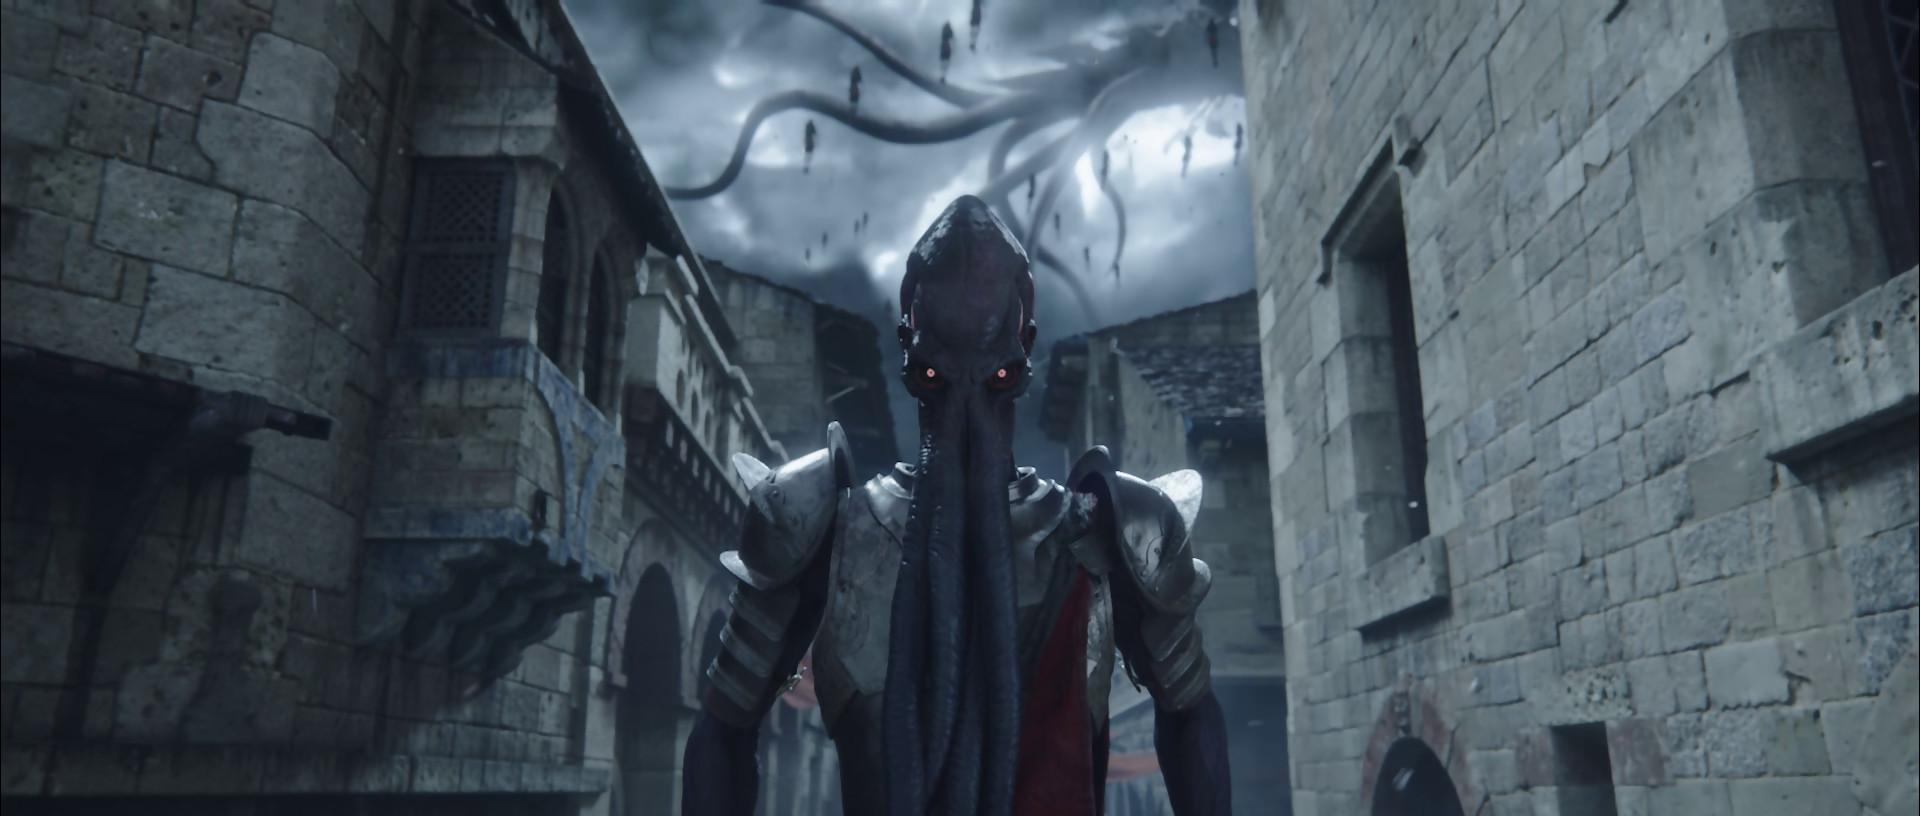 Утечка: скриншоты Baldur's Gate III 8